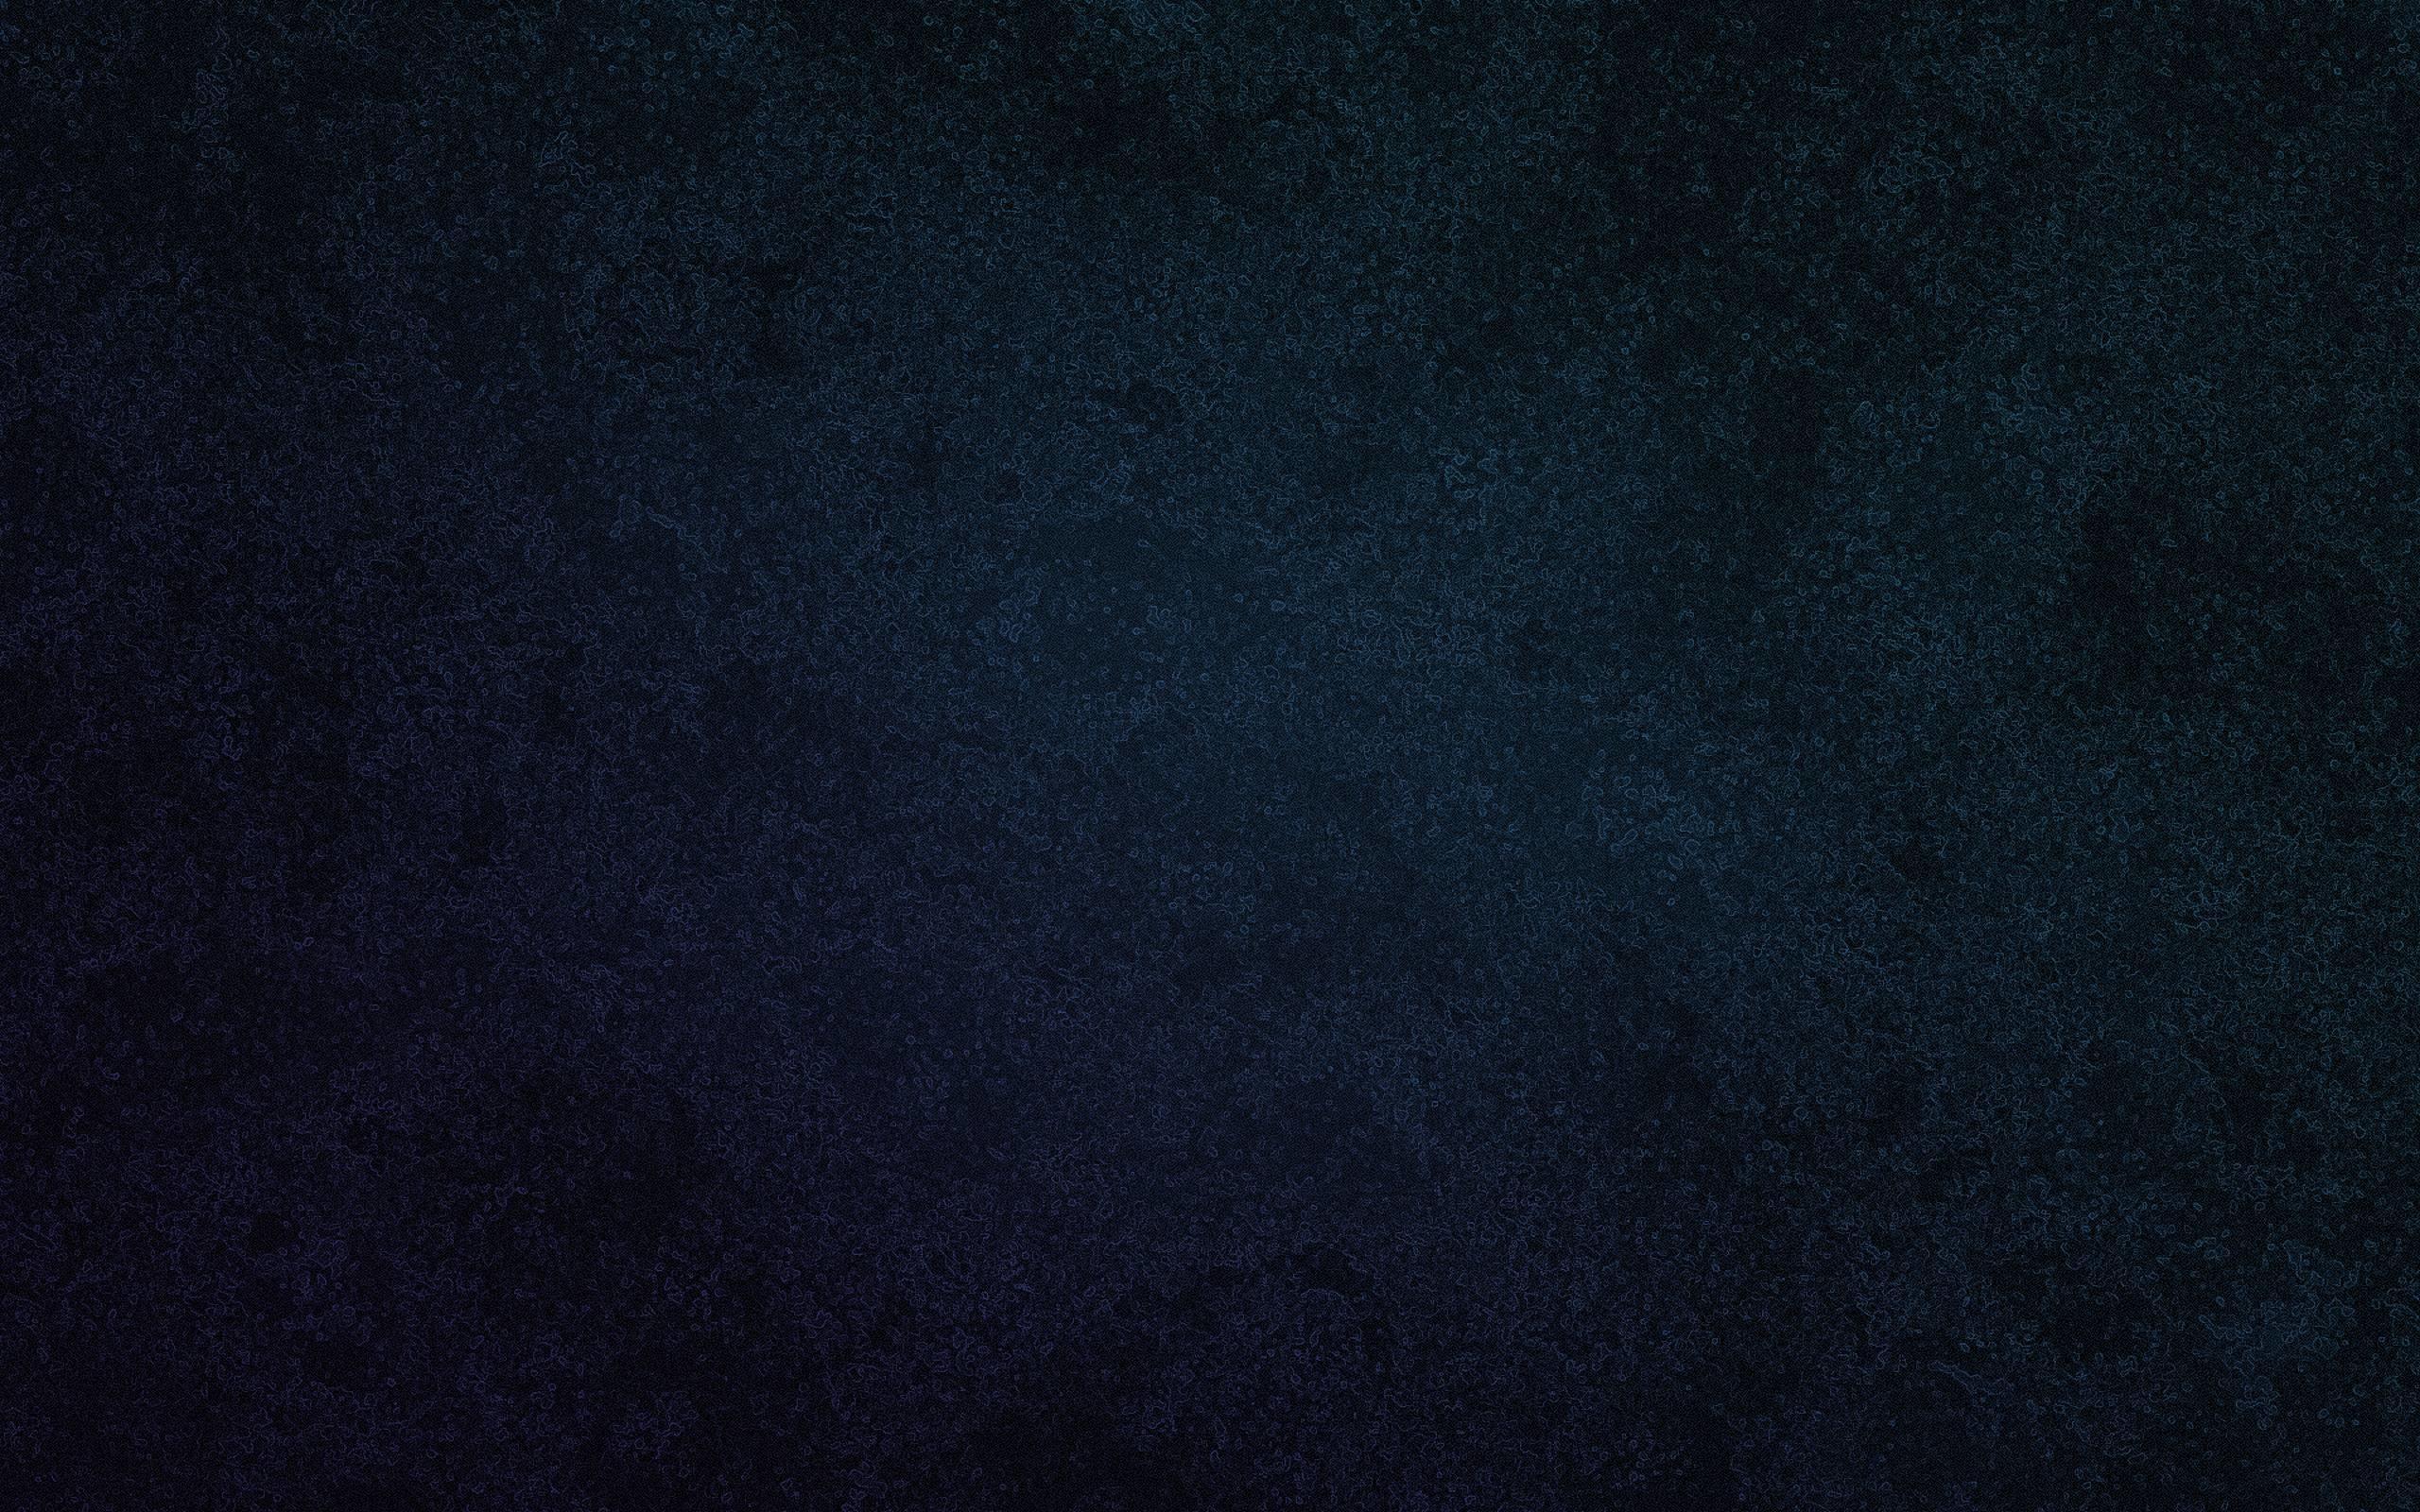 Super HD Texture Wallpapers